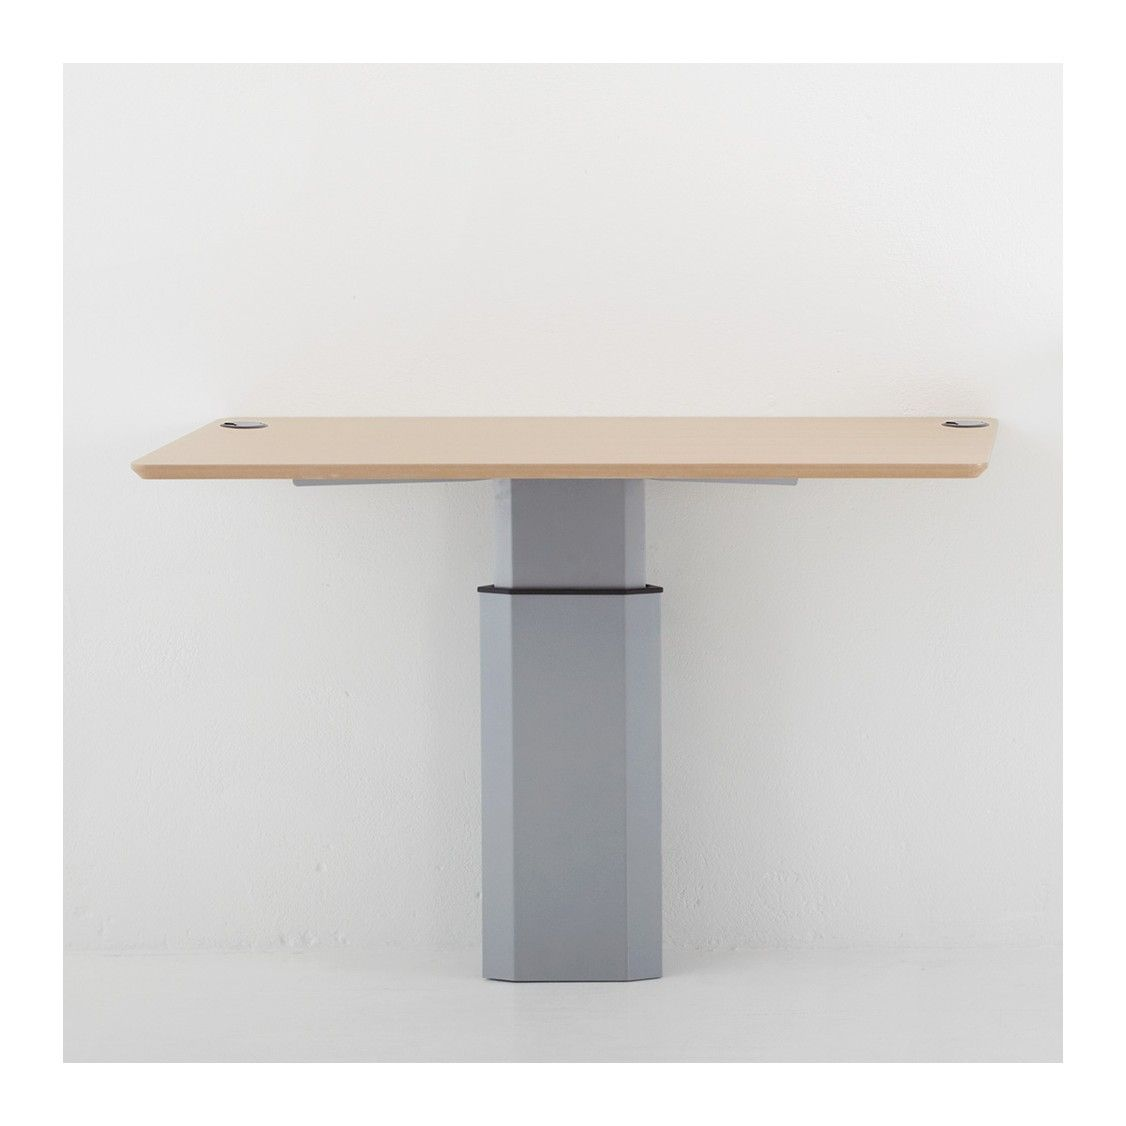 Wall Mounted Standing Desk Standing Desk Project Pinterest